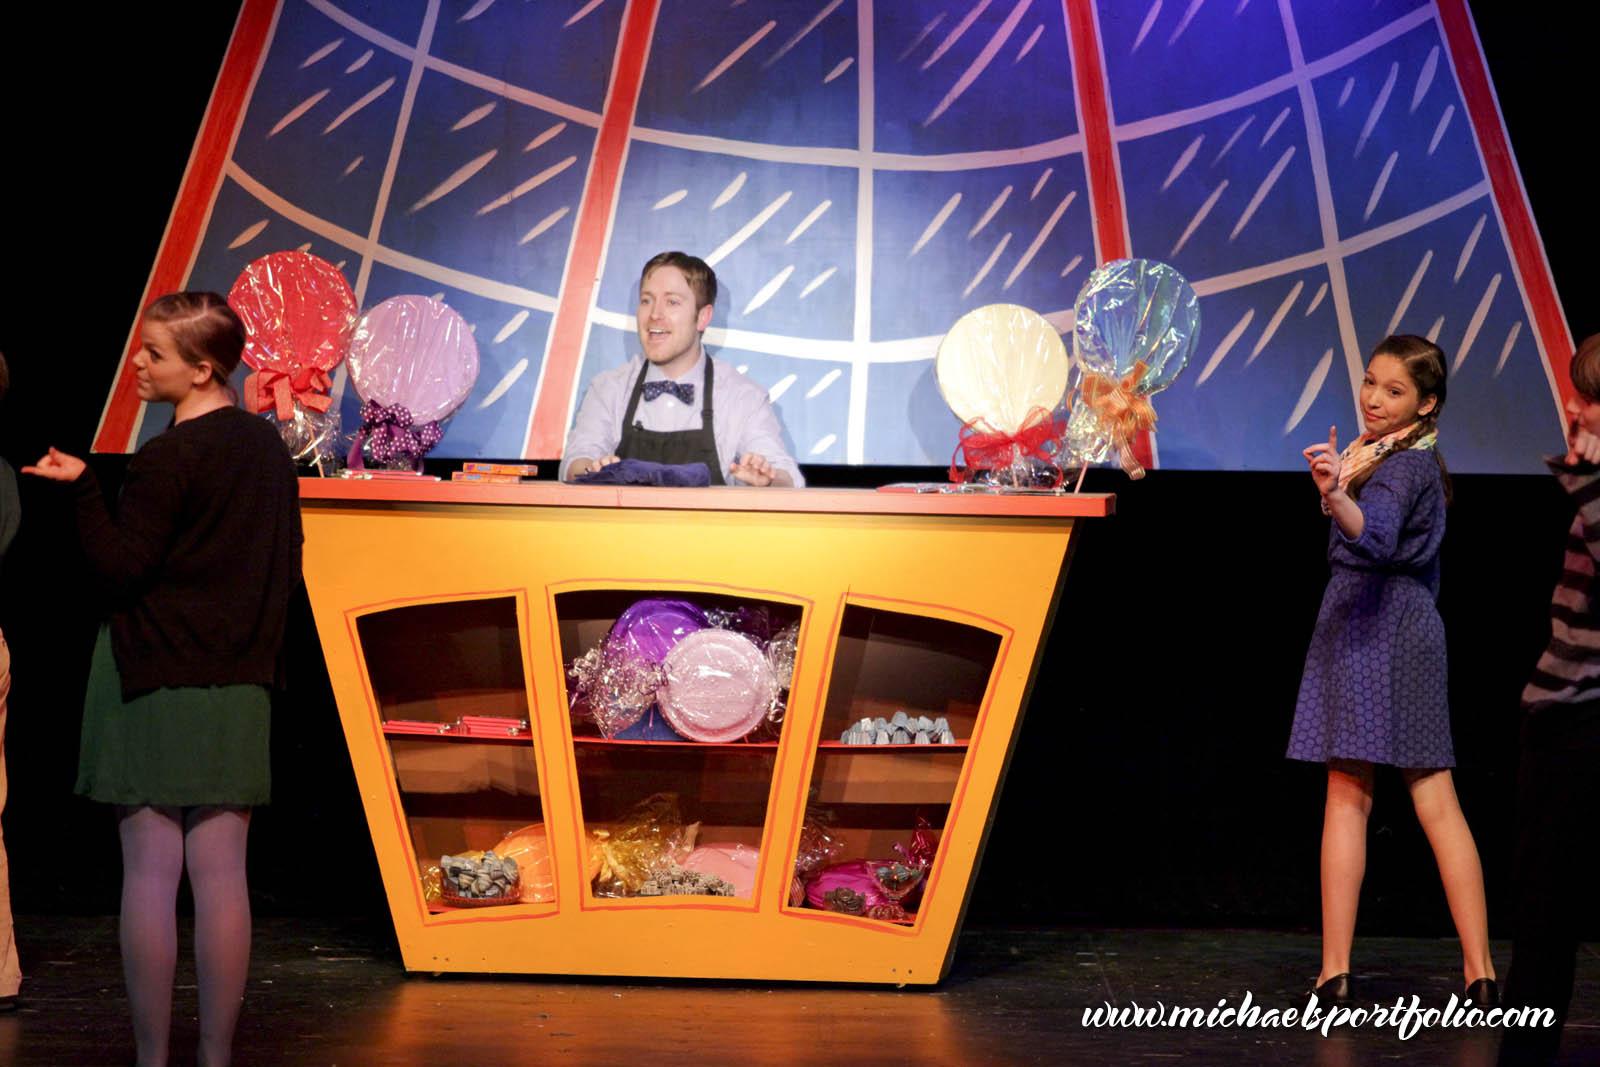 Stage Center - Willy Wonka